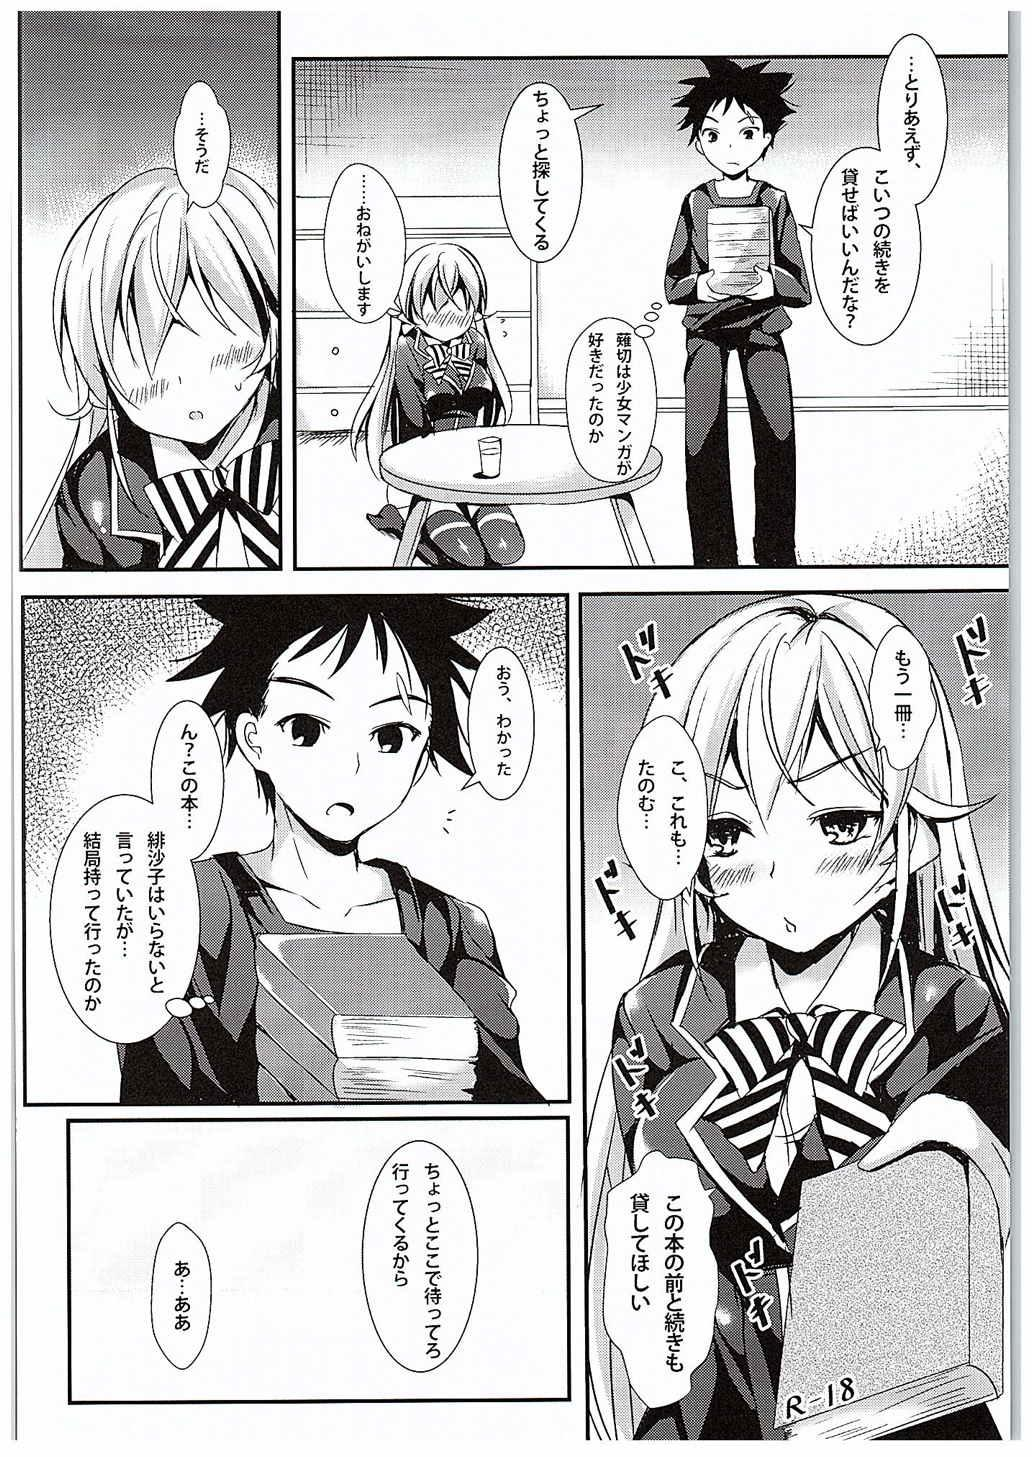 Erina to Shoujo Manga 2